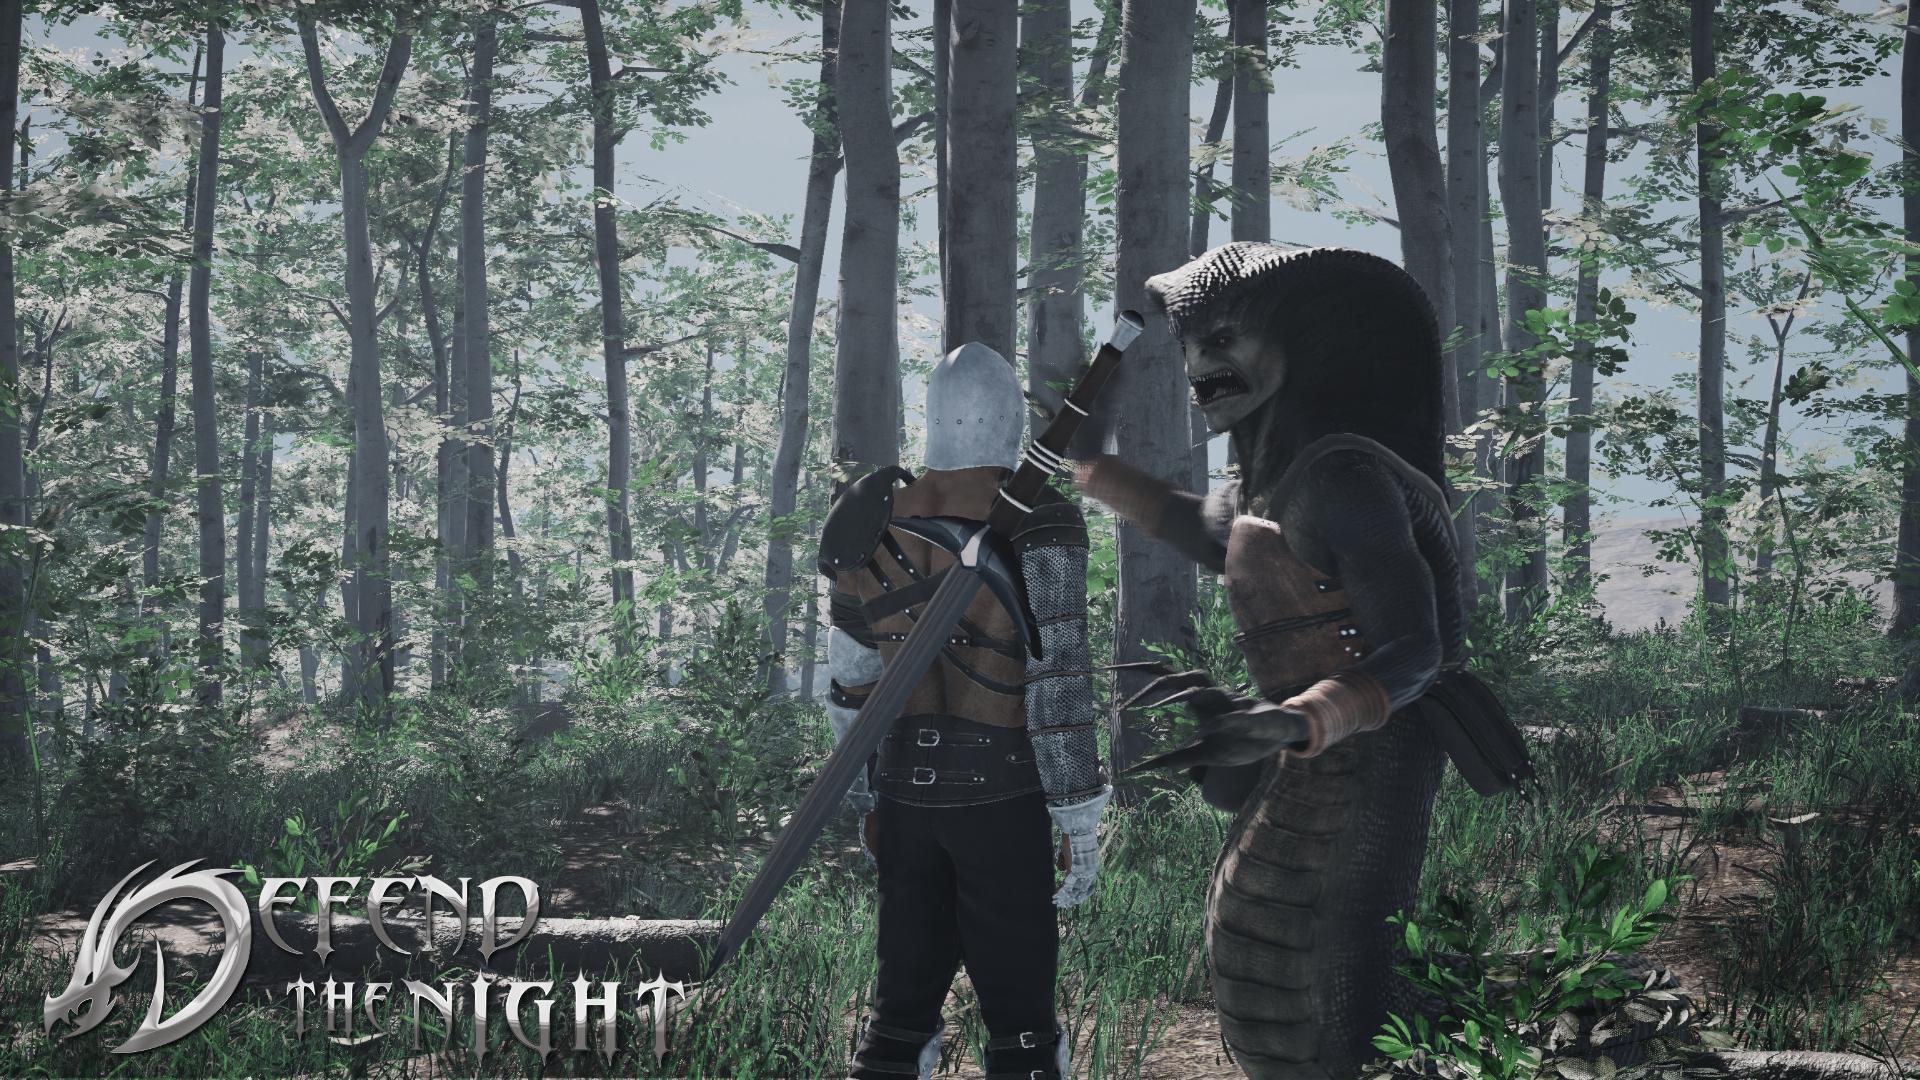 In Development: Defend The Night